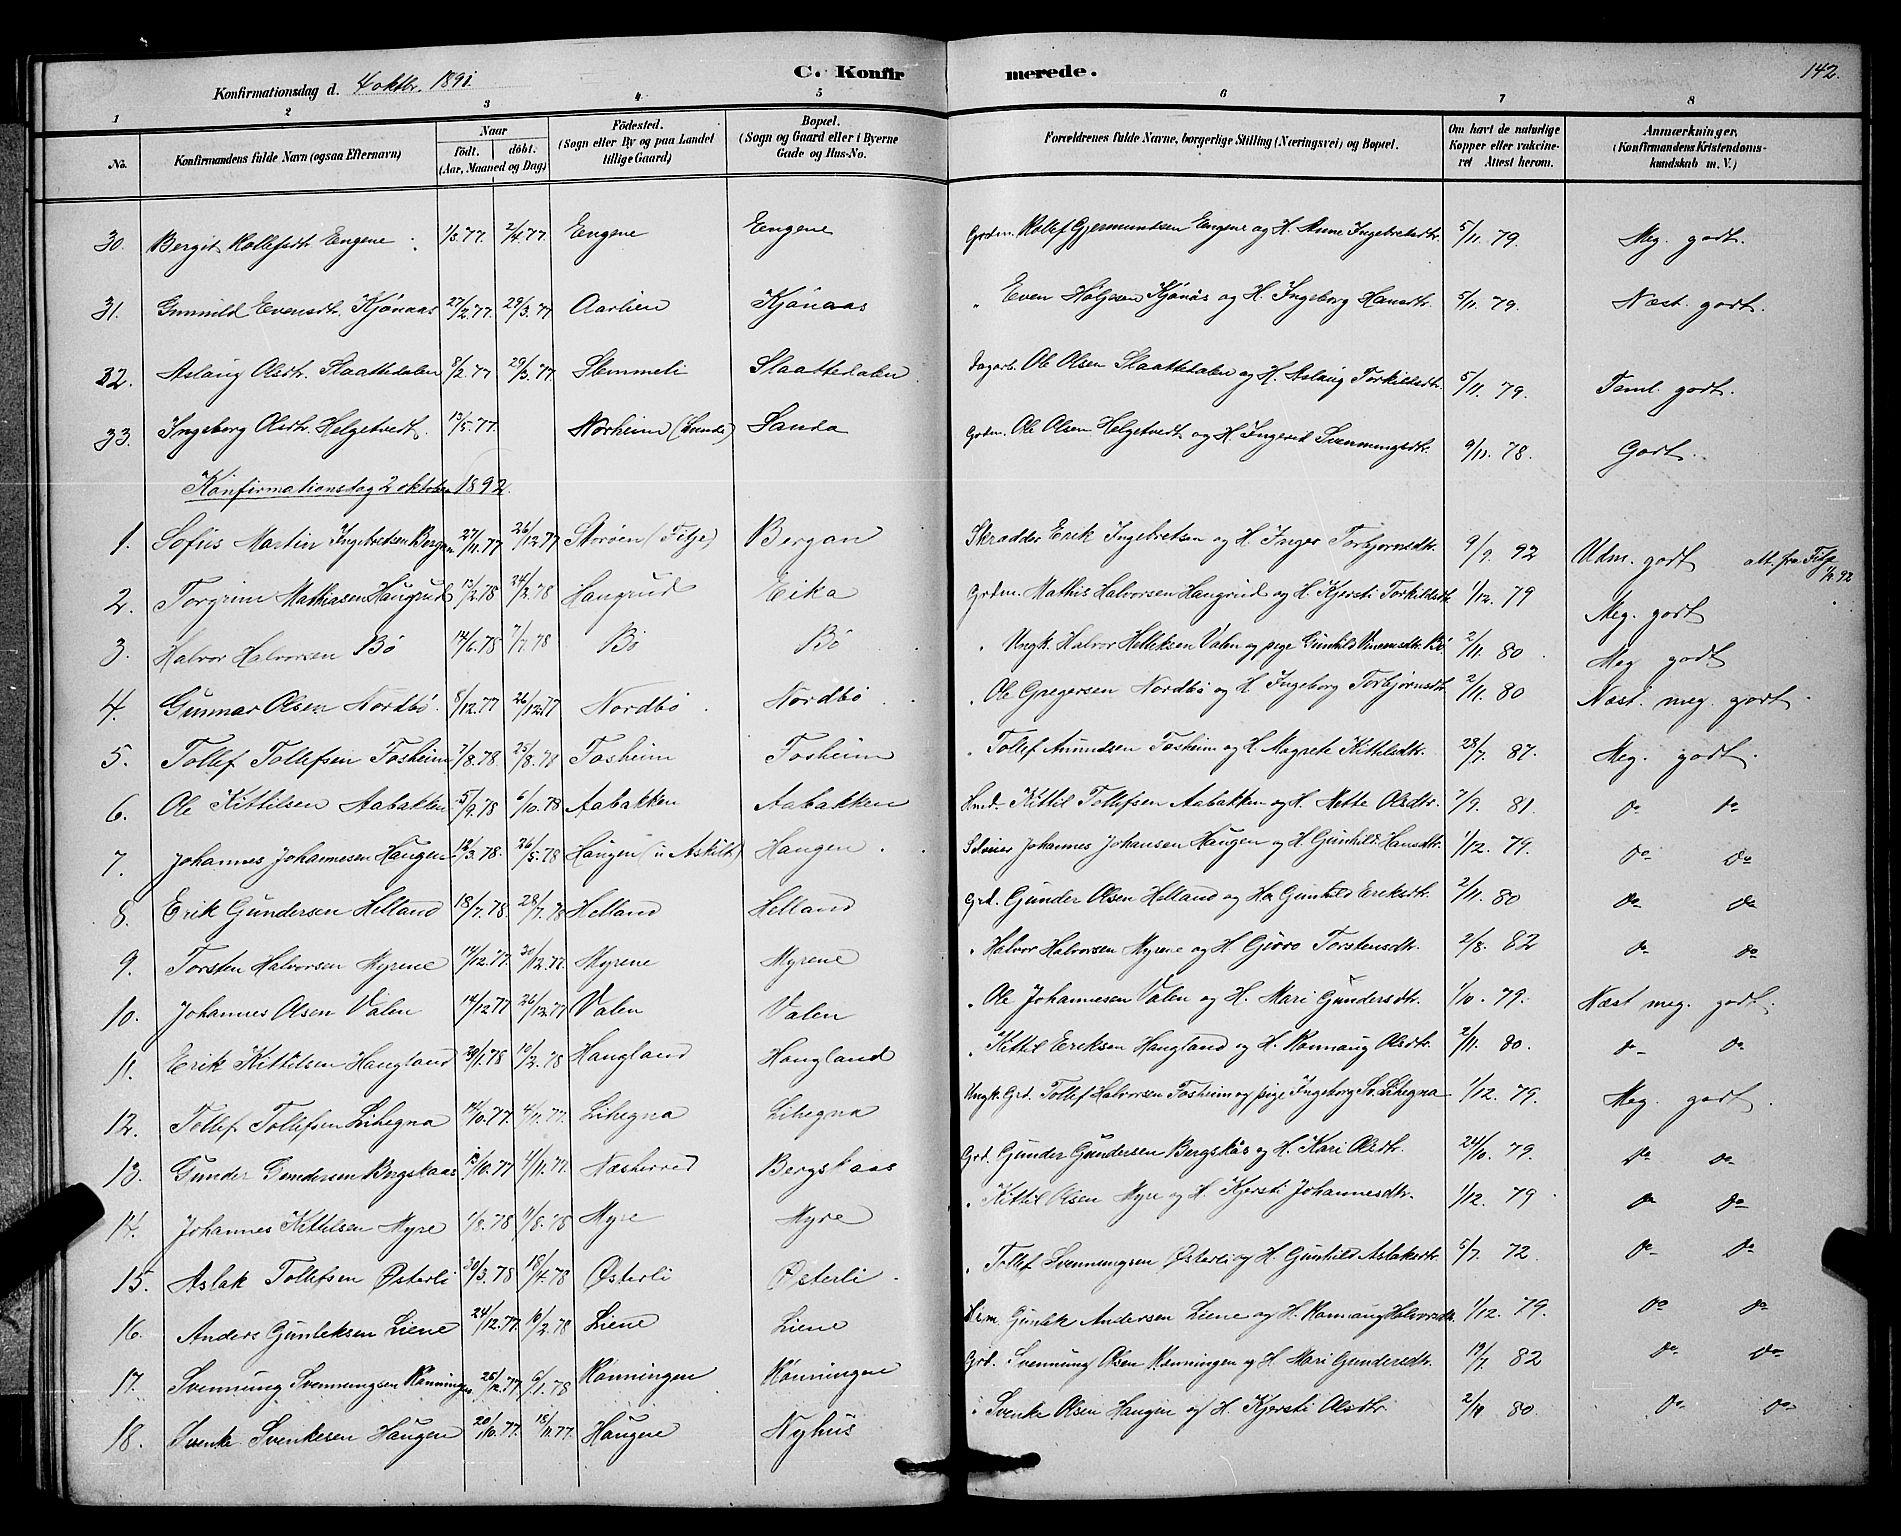 SAKO, Bø kirkebøker, G/Ga/L0005: Klokkerbok nr. 5, 1883-1897, s. 142